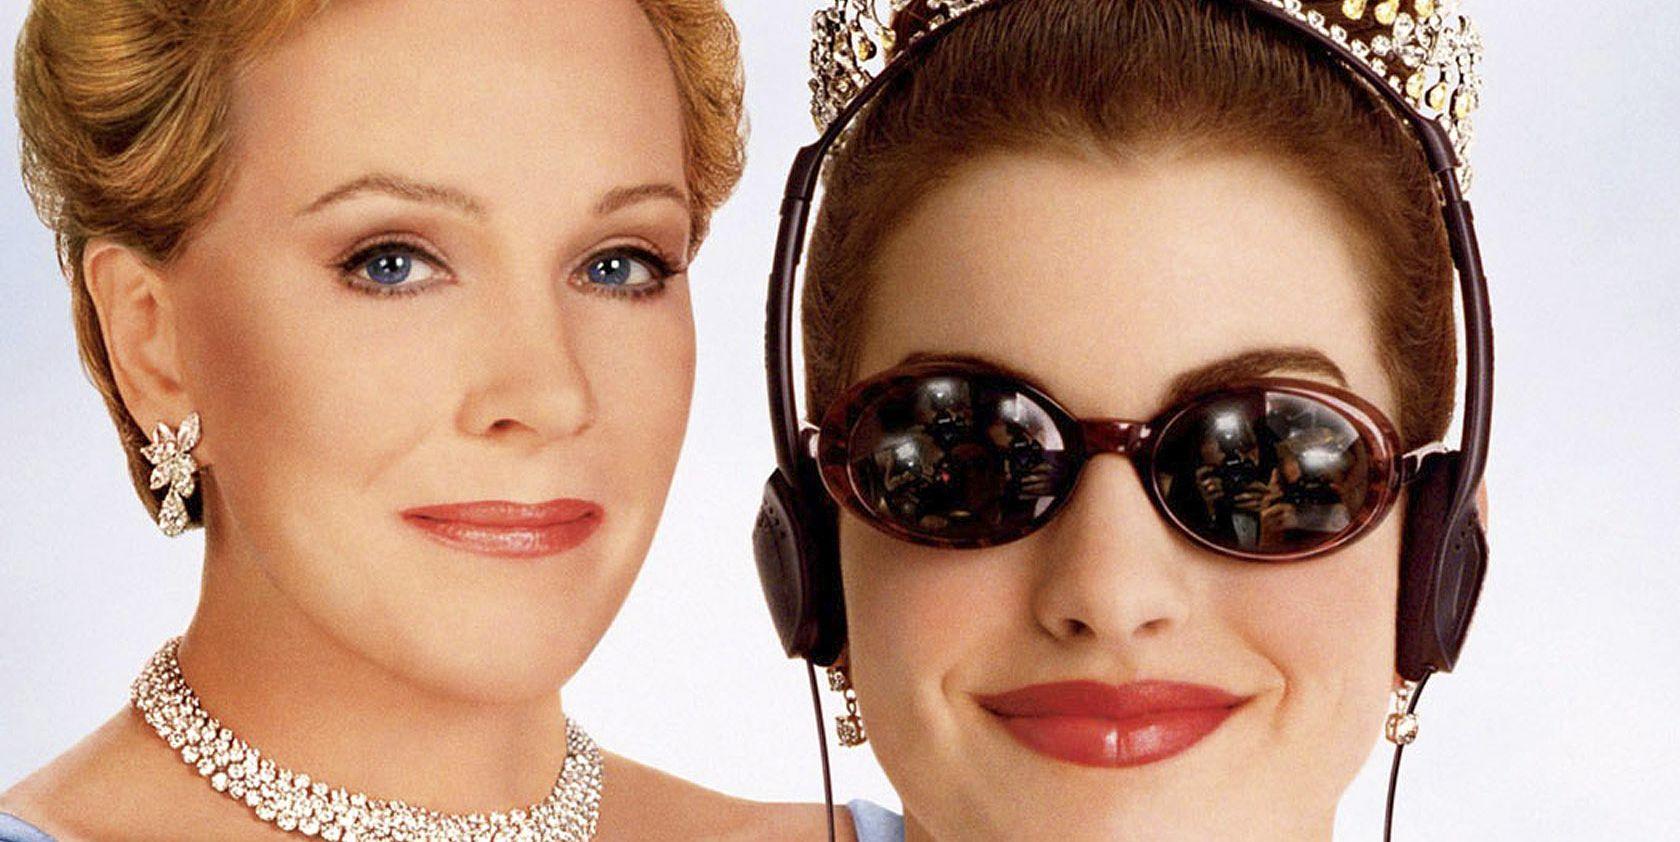 THE PRINCESS DIARIES, Julie Andrews, Anne Hathaway, 2001, (c) Walt Disney/courtesy Everett Collectio